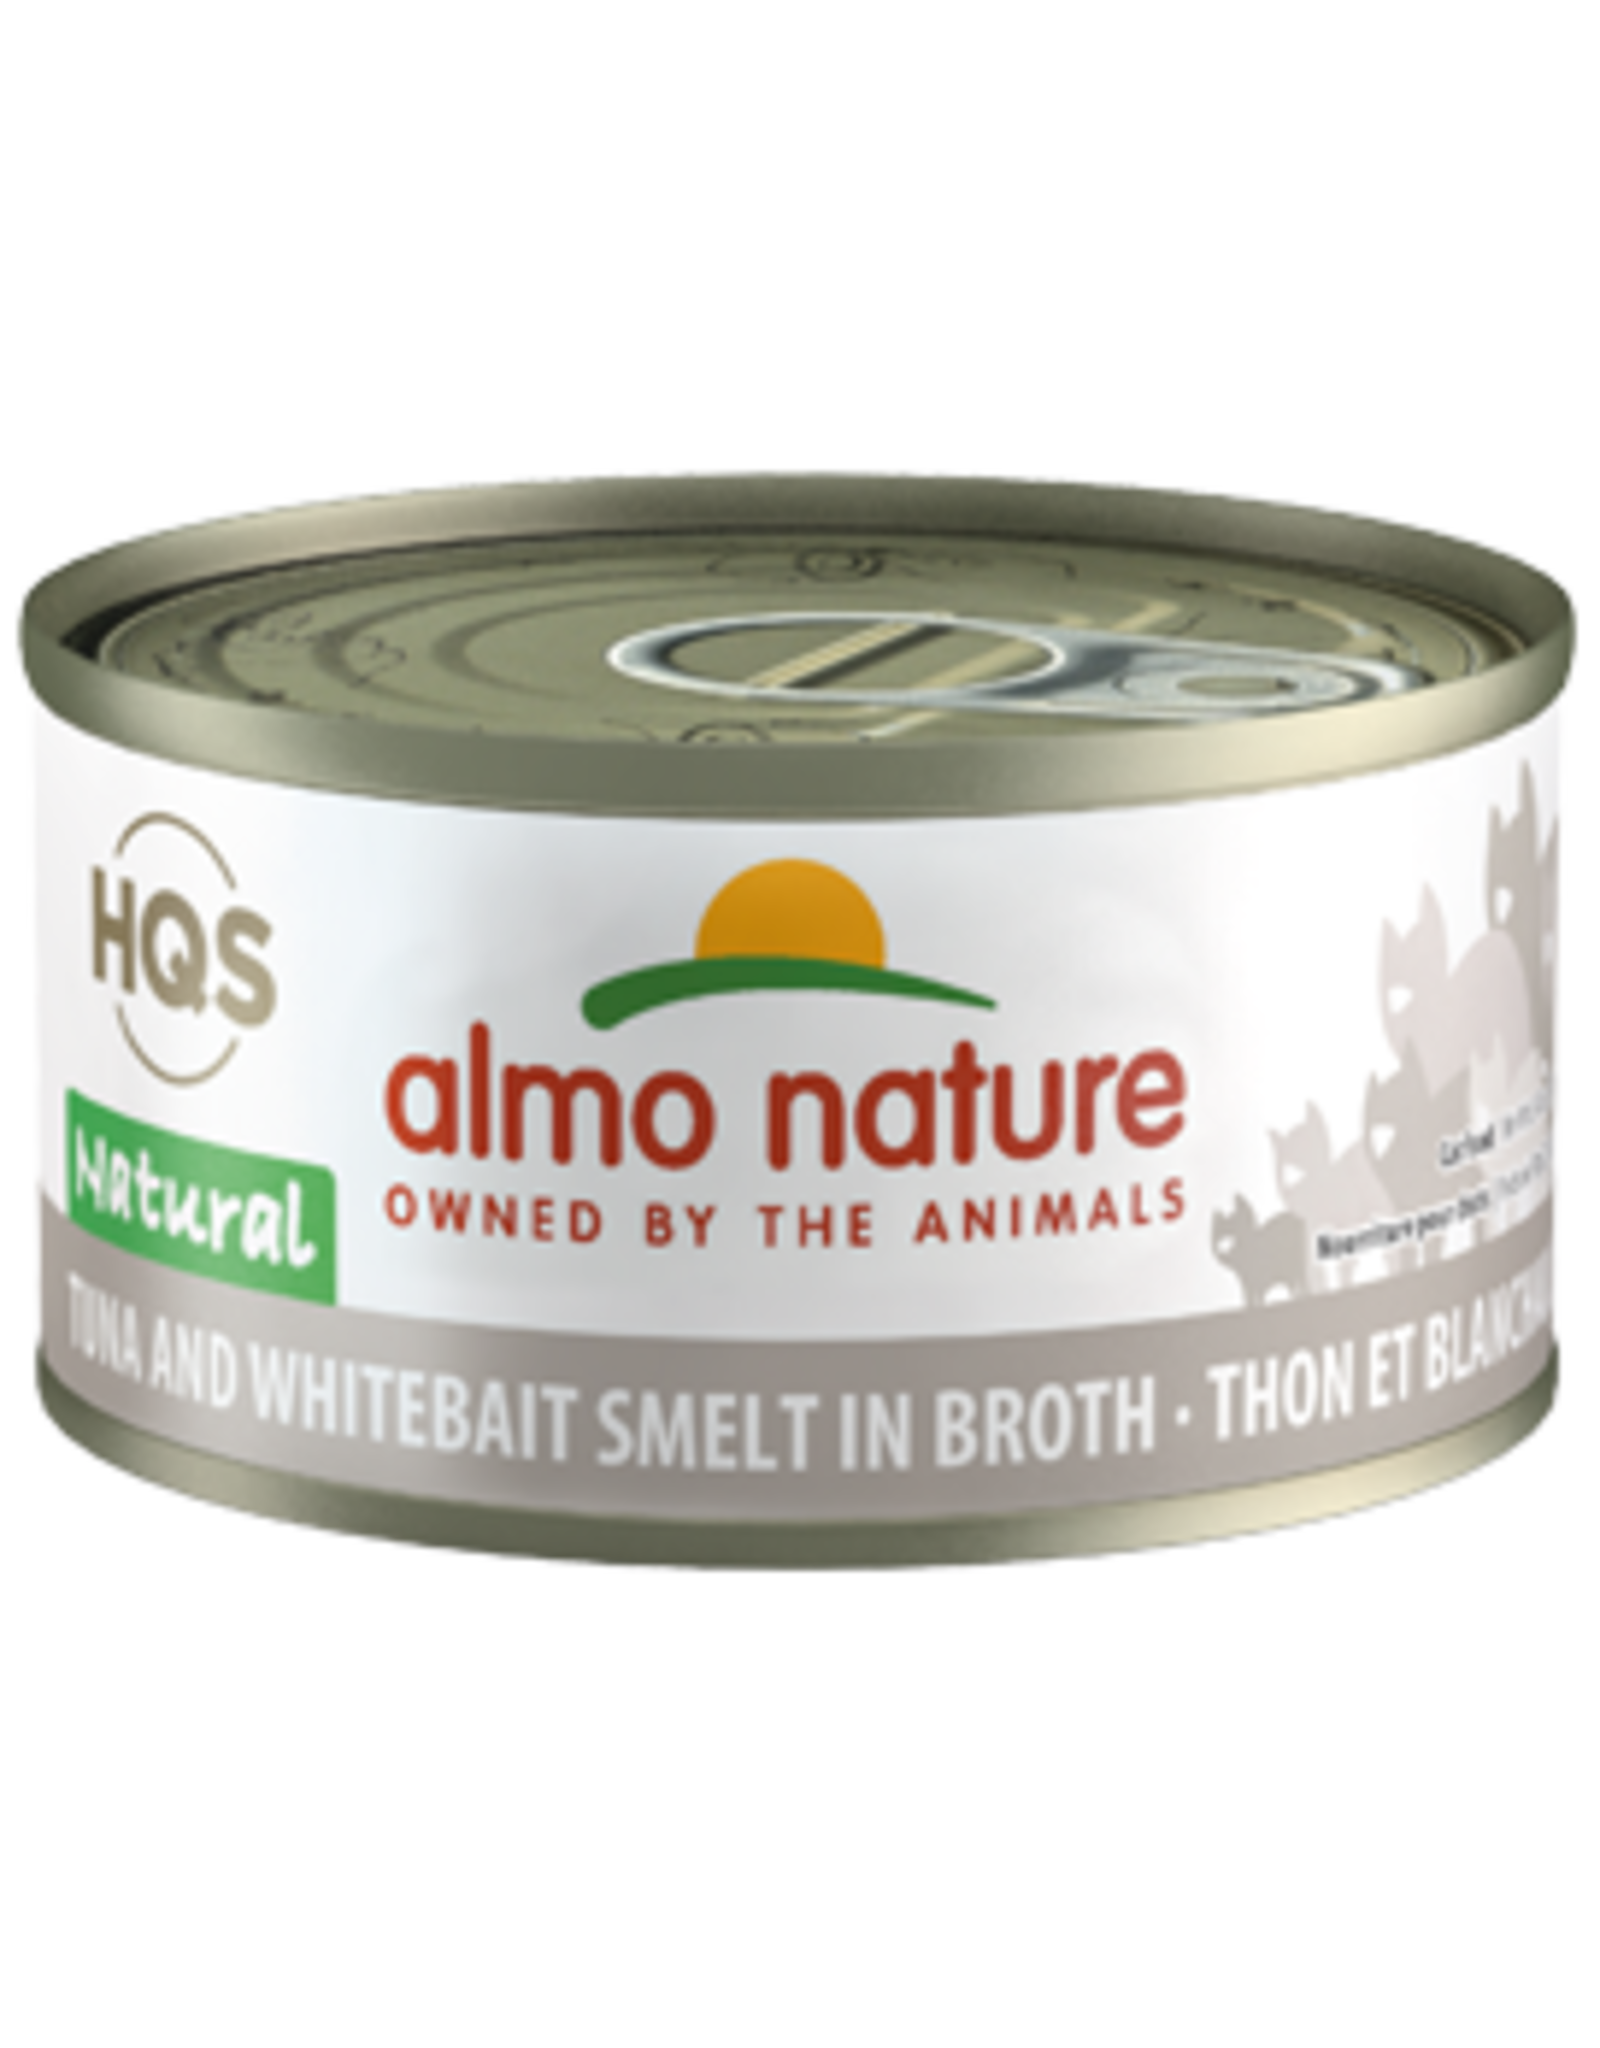 Almo Nature Almo Nature HQS Natural Tuna & Whitebait Smelt in Broth Cat Food 2.47 Oz